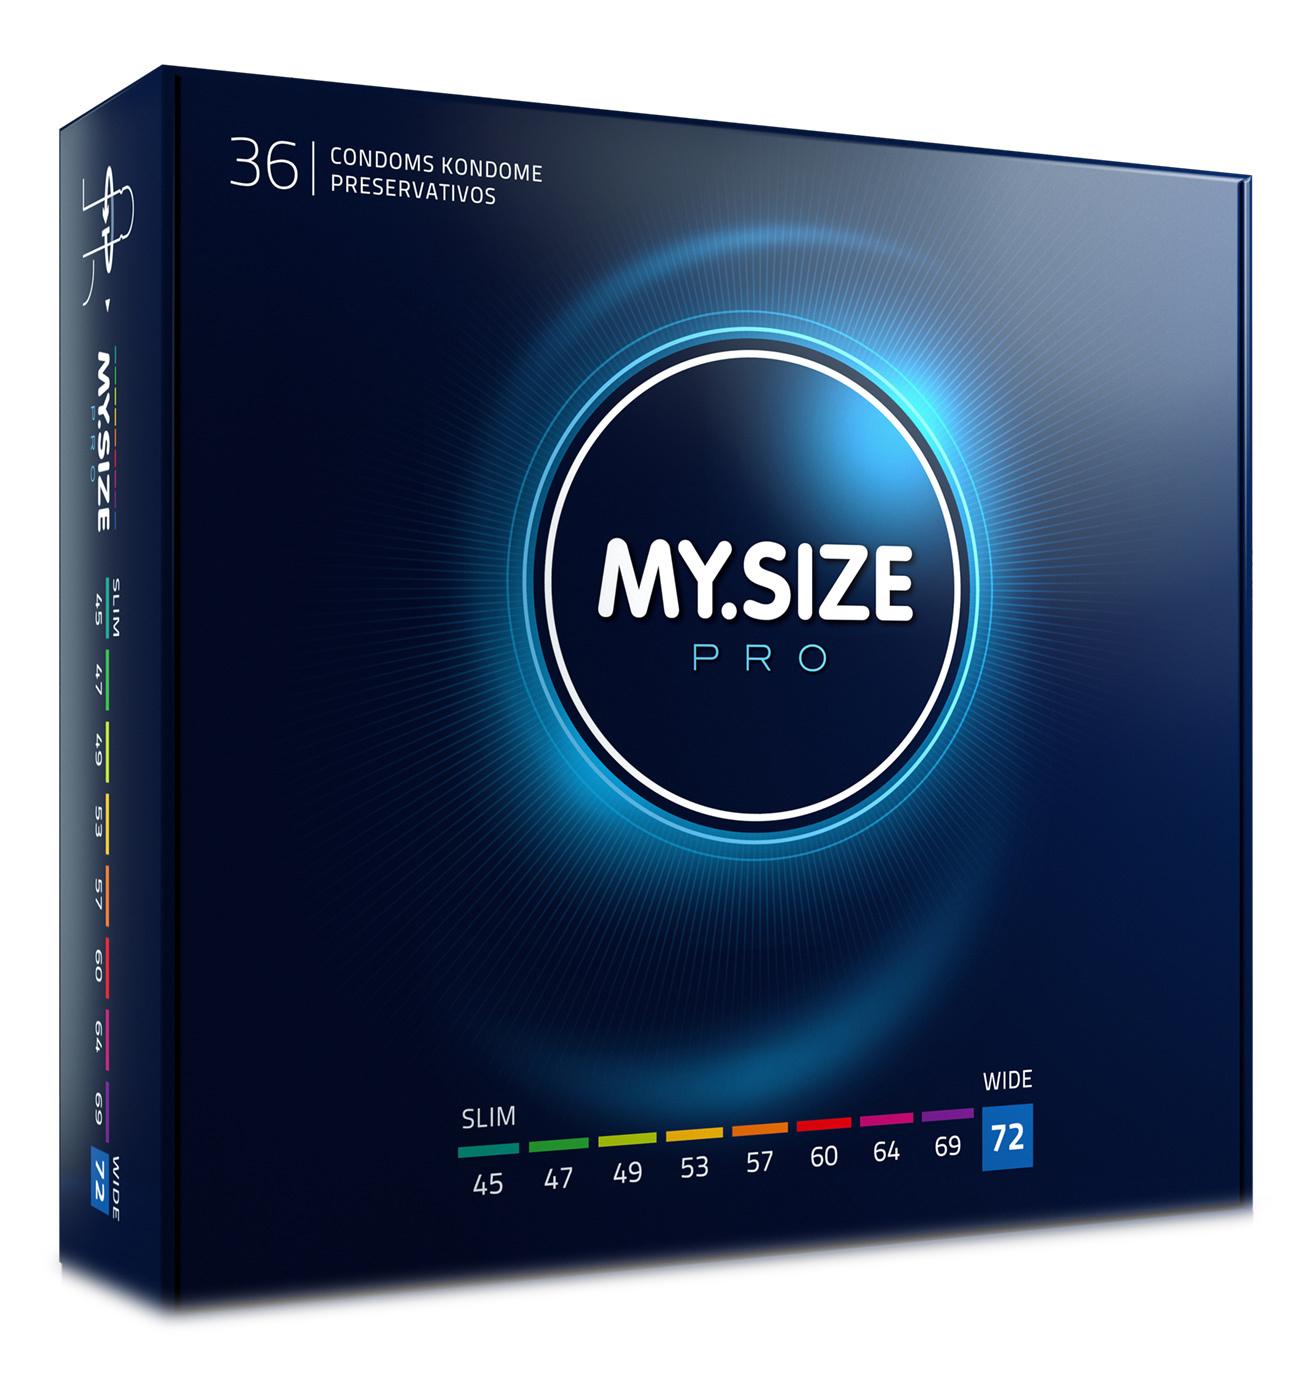 MySize 72mm - Ruimere XXXXL Condooms 36 stuks